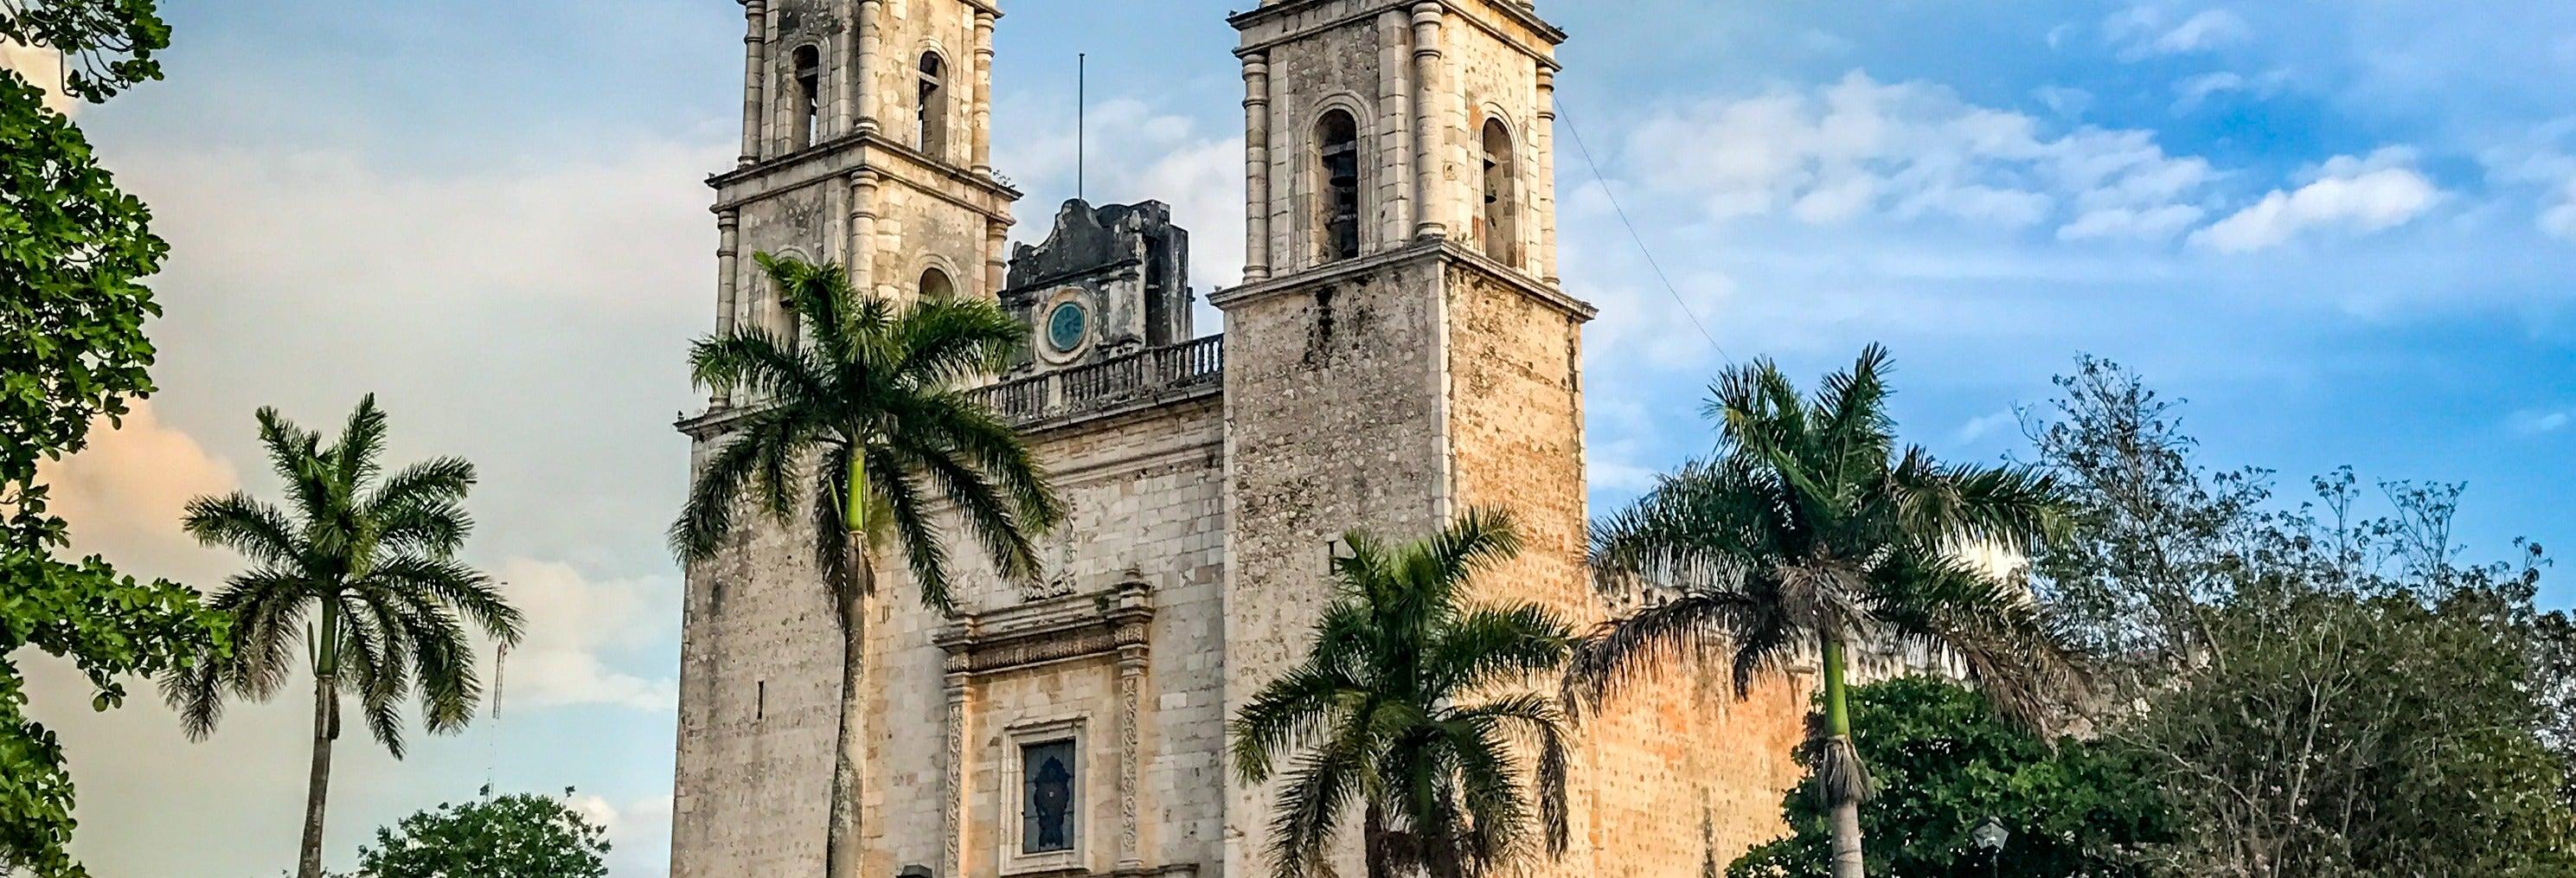 Free Tour of Valladolid